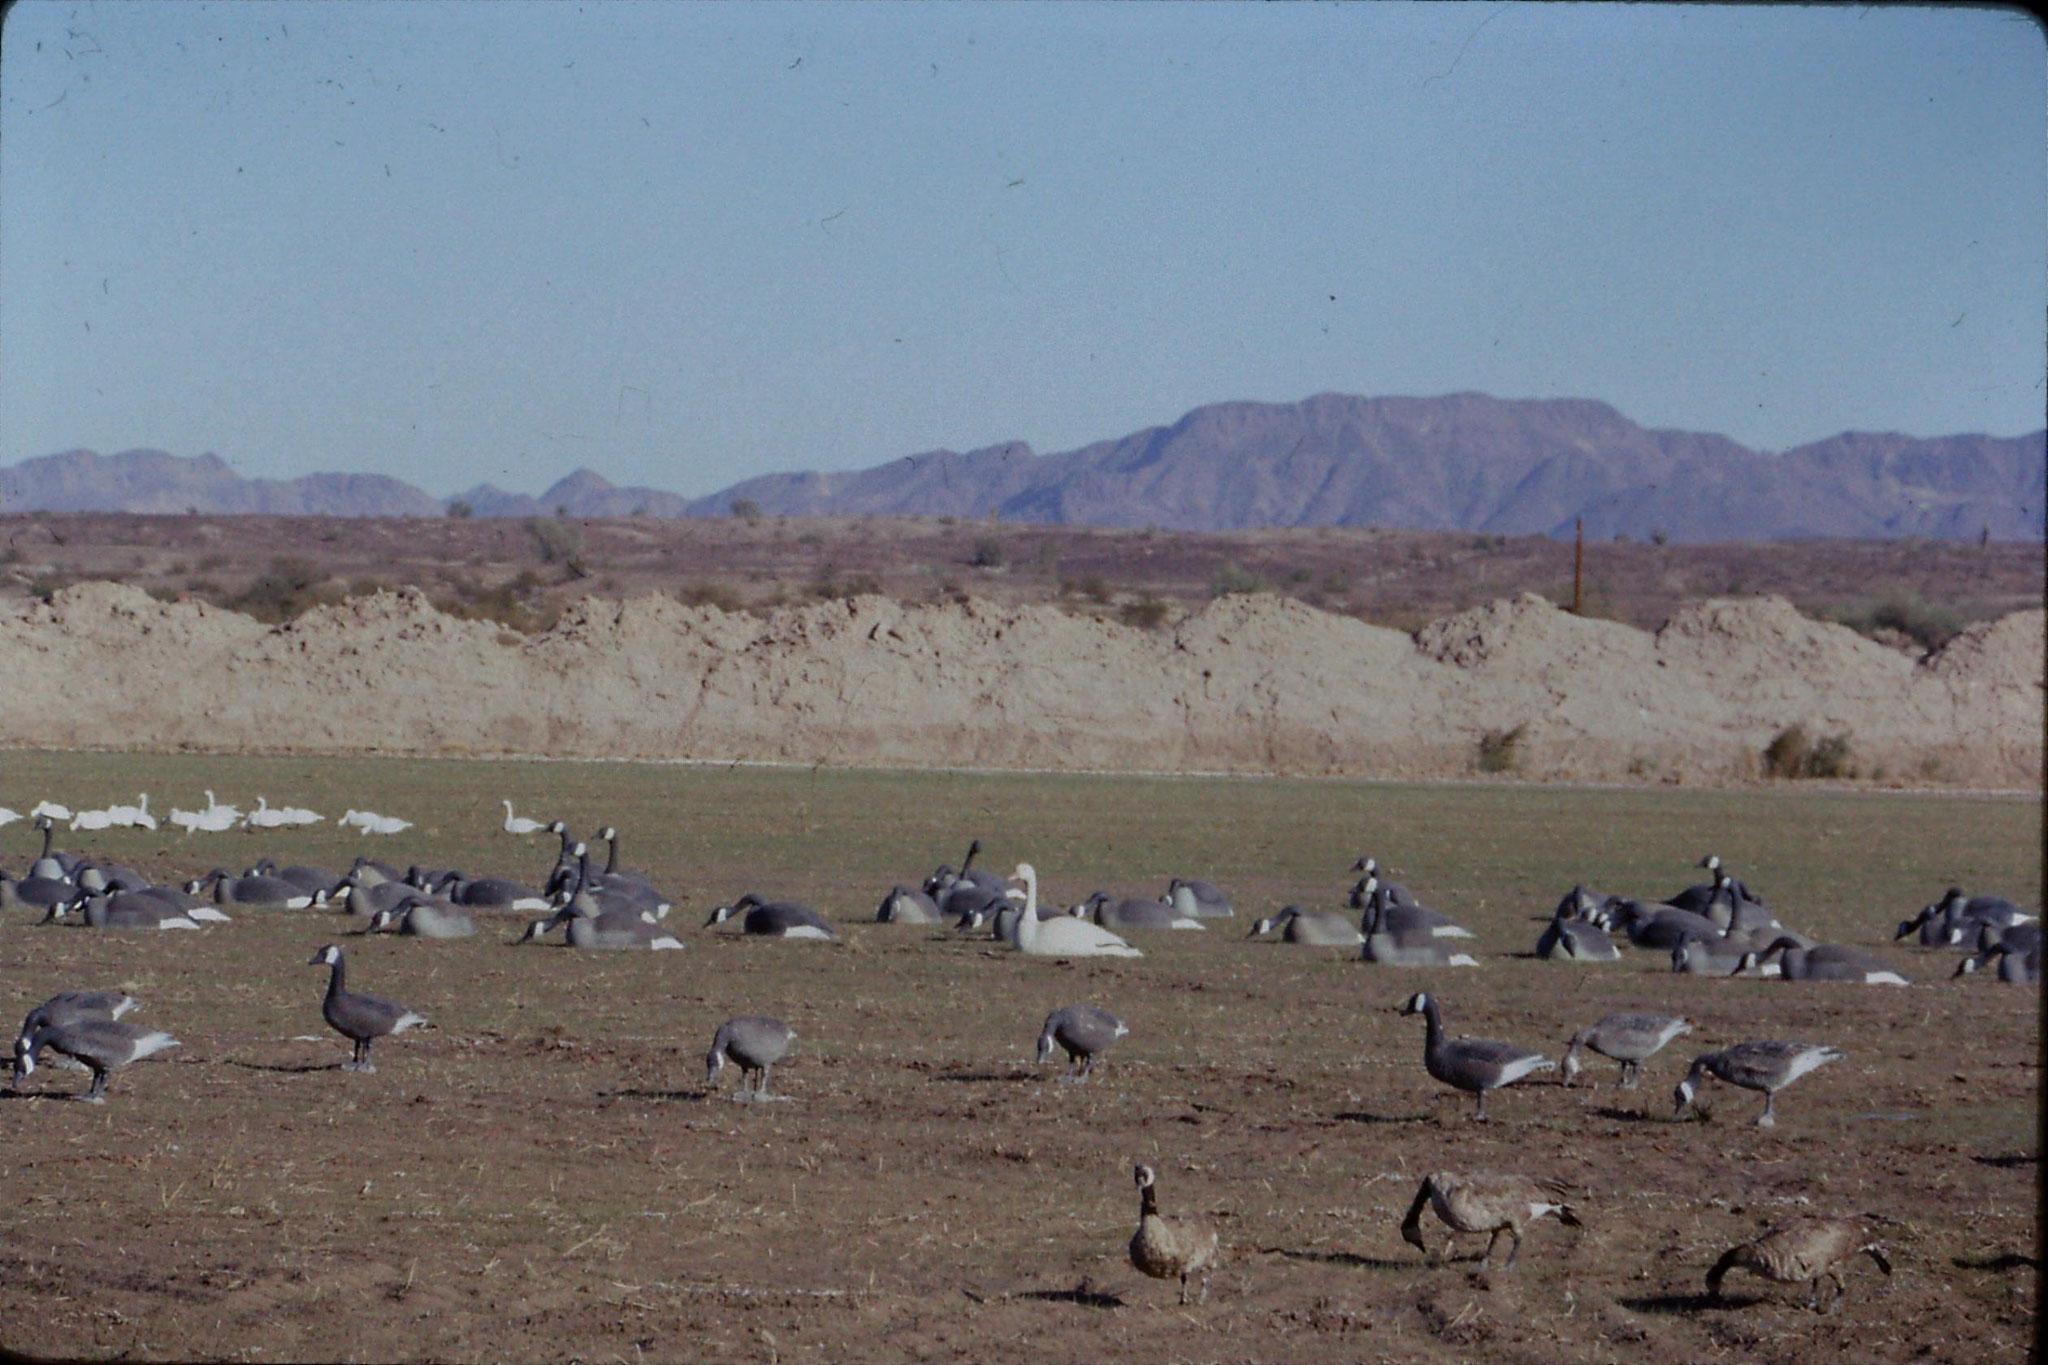 10/12/1990: 4: Cibola WR, decoy geese